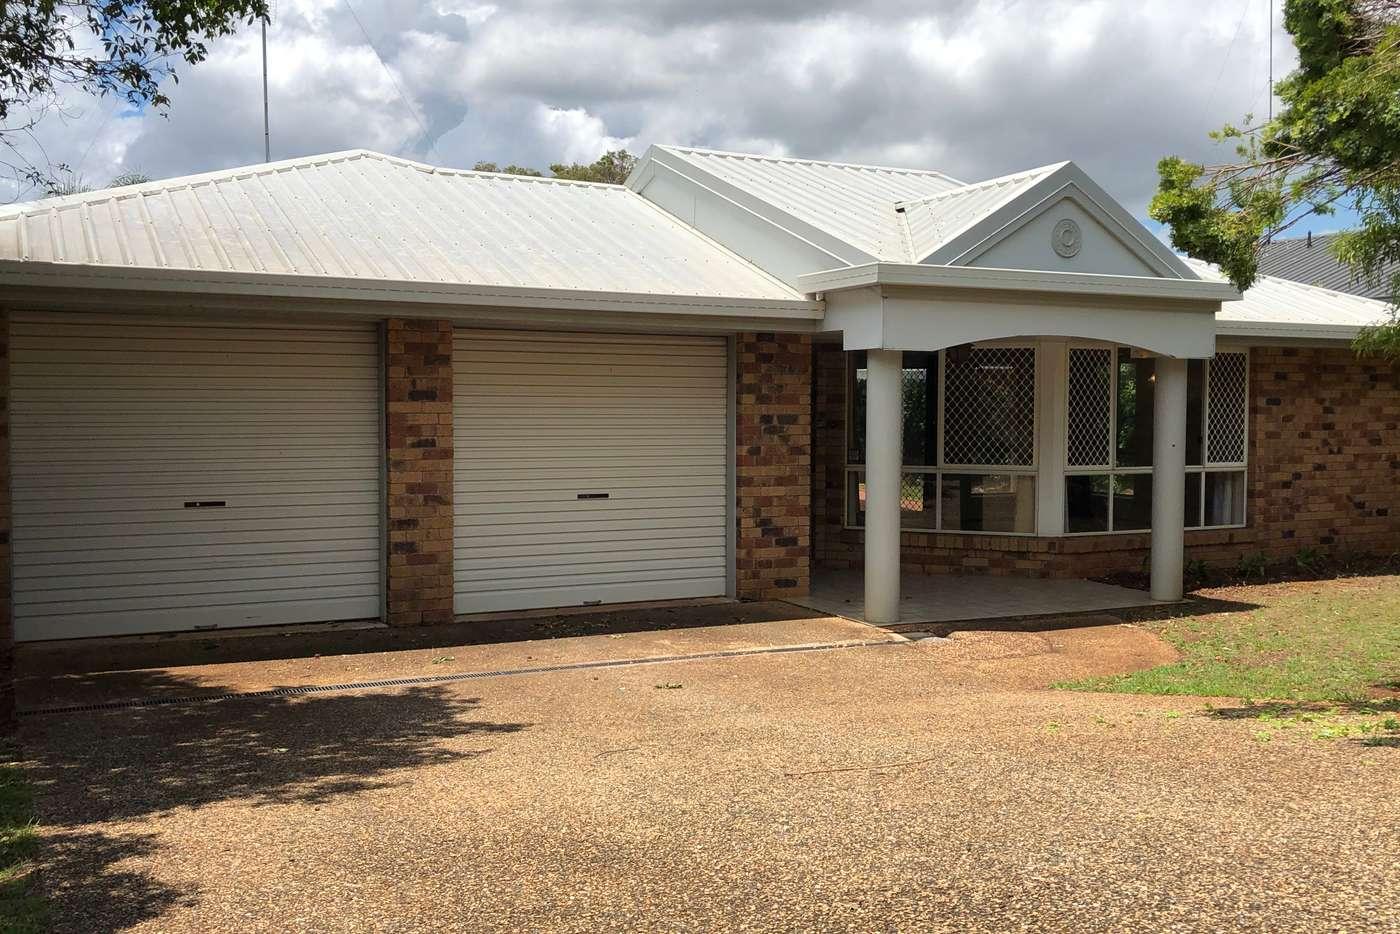 Main view of Homely house listing, 35 Boshammer Street, Rangeville QLD 4350